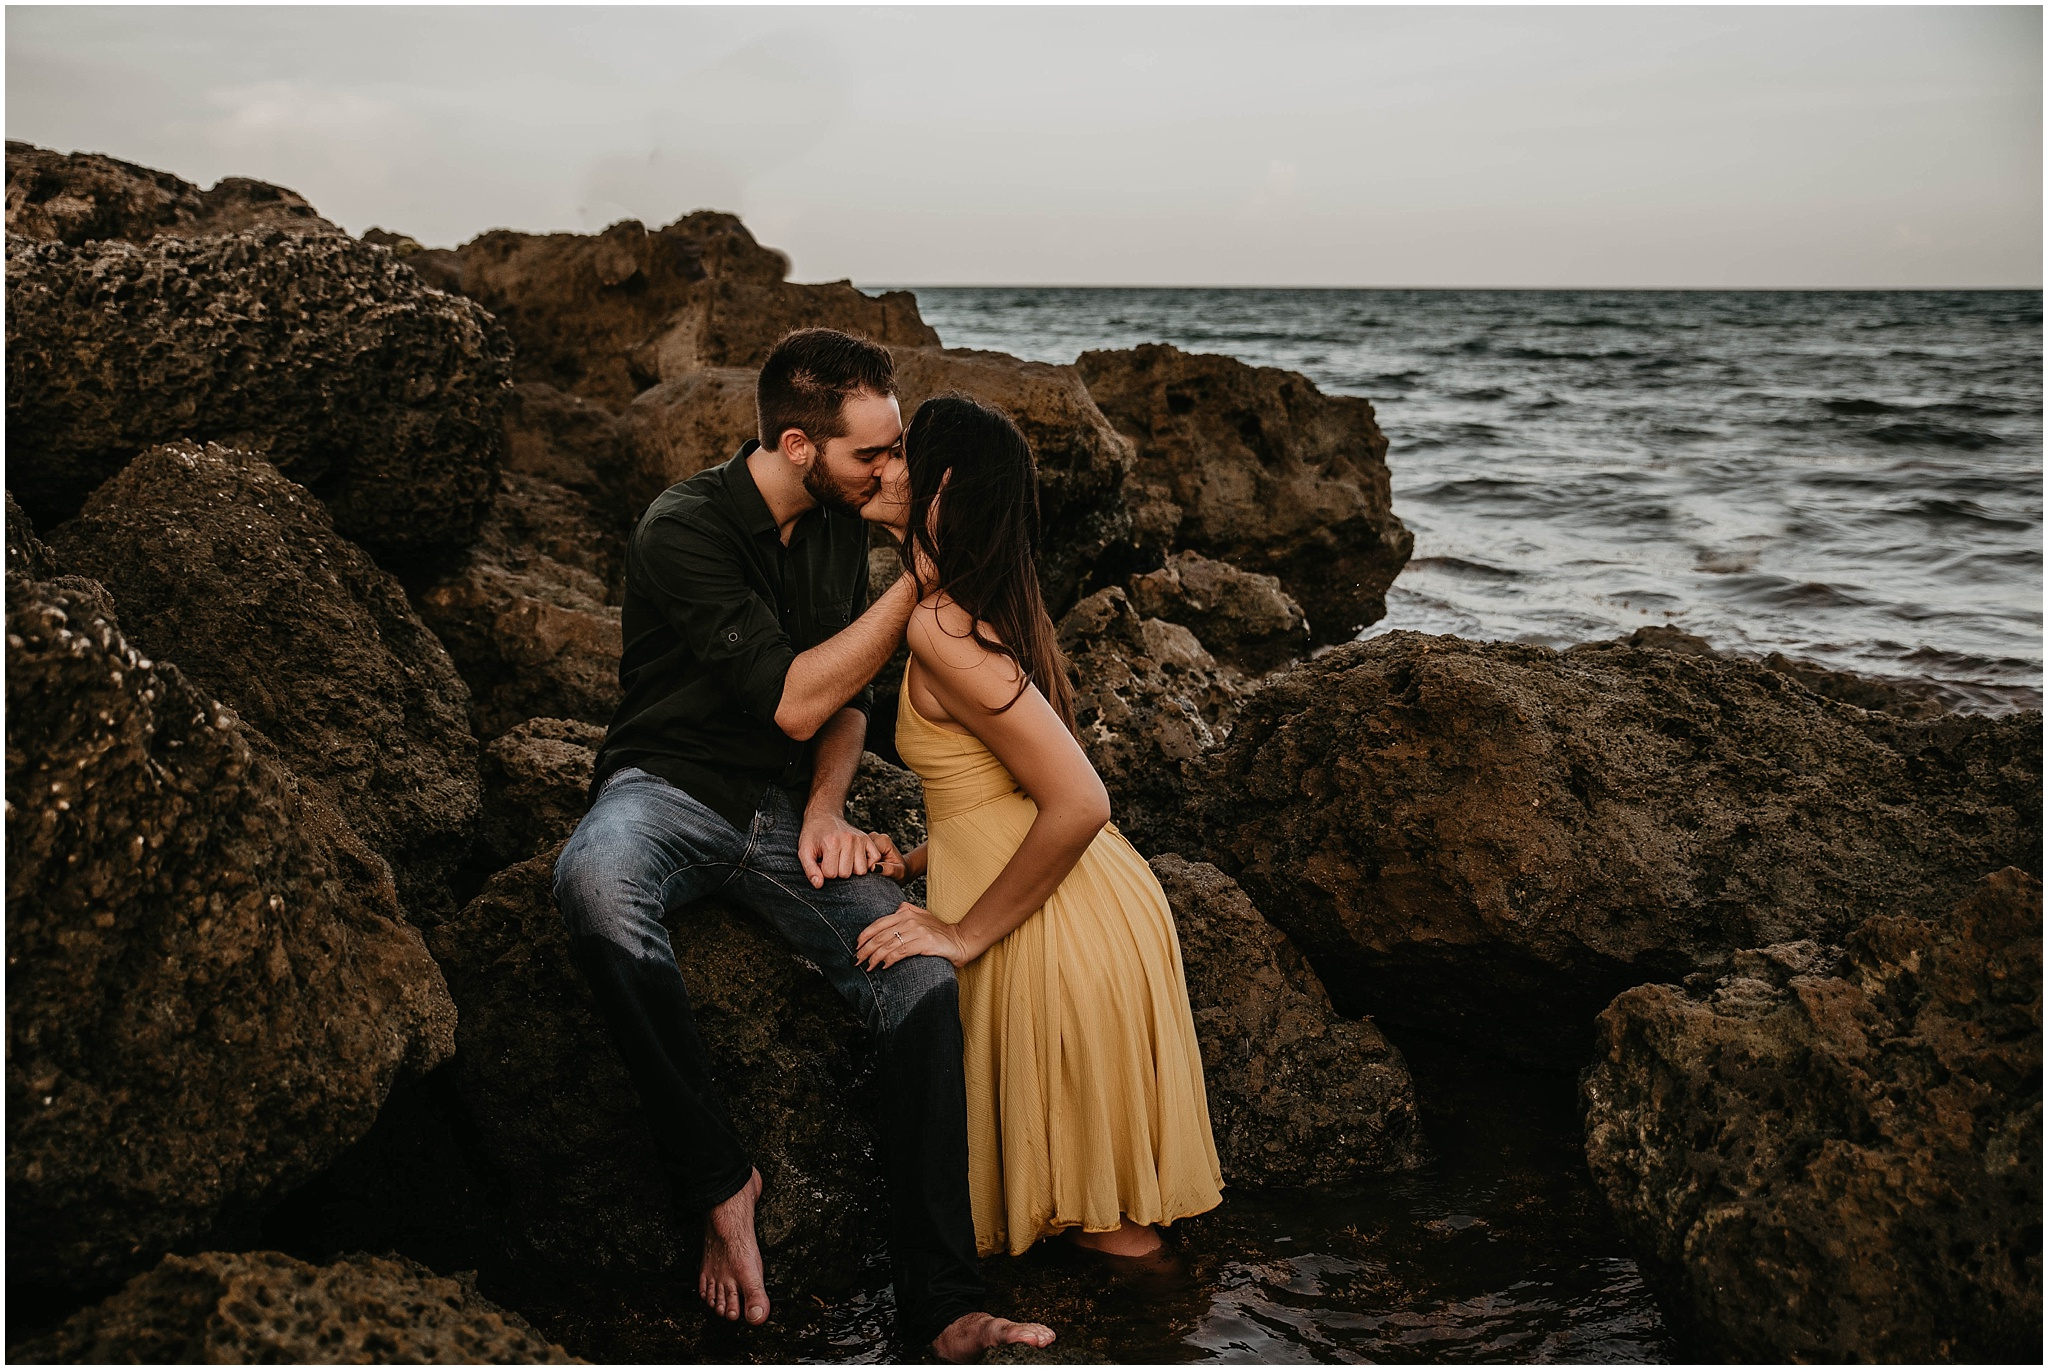 Worth-Avenue-Palm-Beach-engagement-photographer_0017.jpg